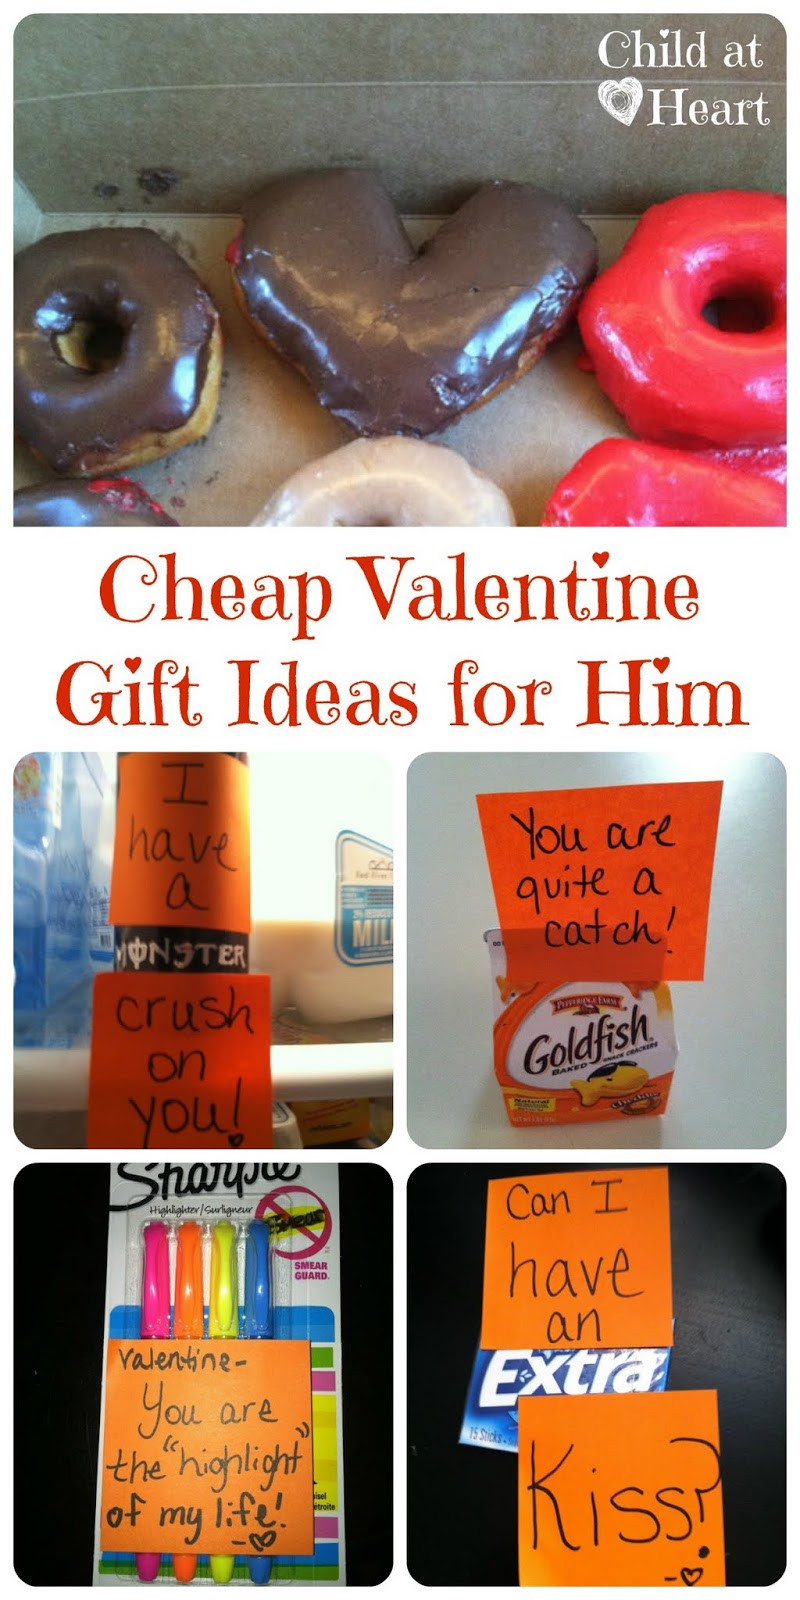 Valentines Gift Ideas For Boyfriends  Cheap Valentine Gift Ideas for Him Child at Heart Blog